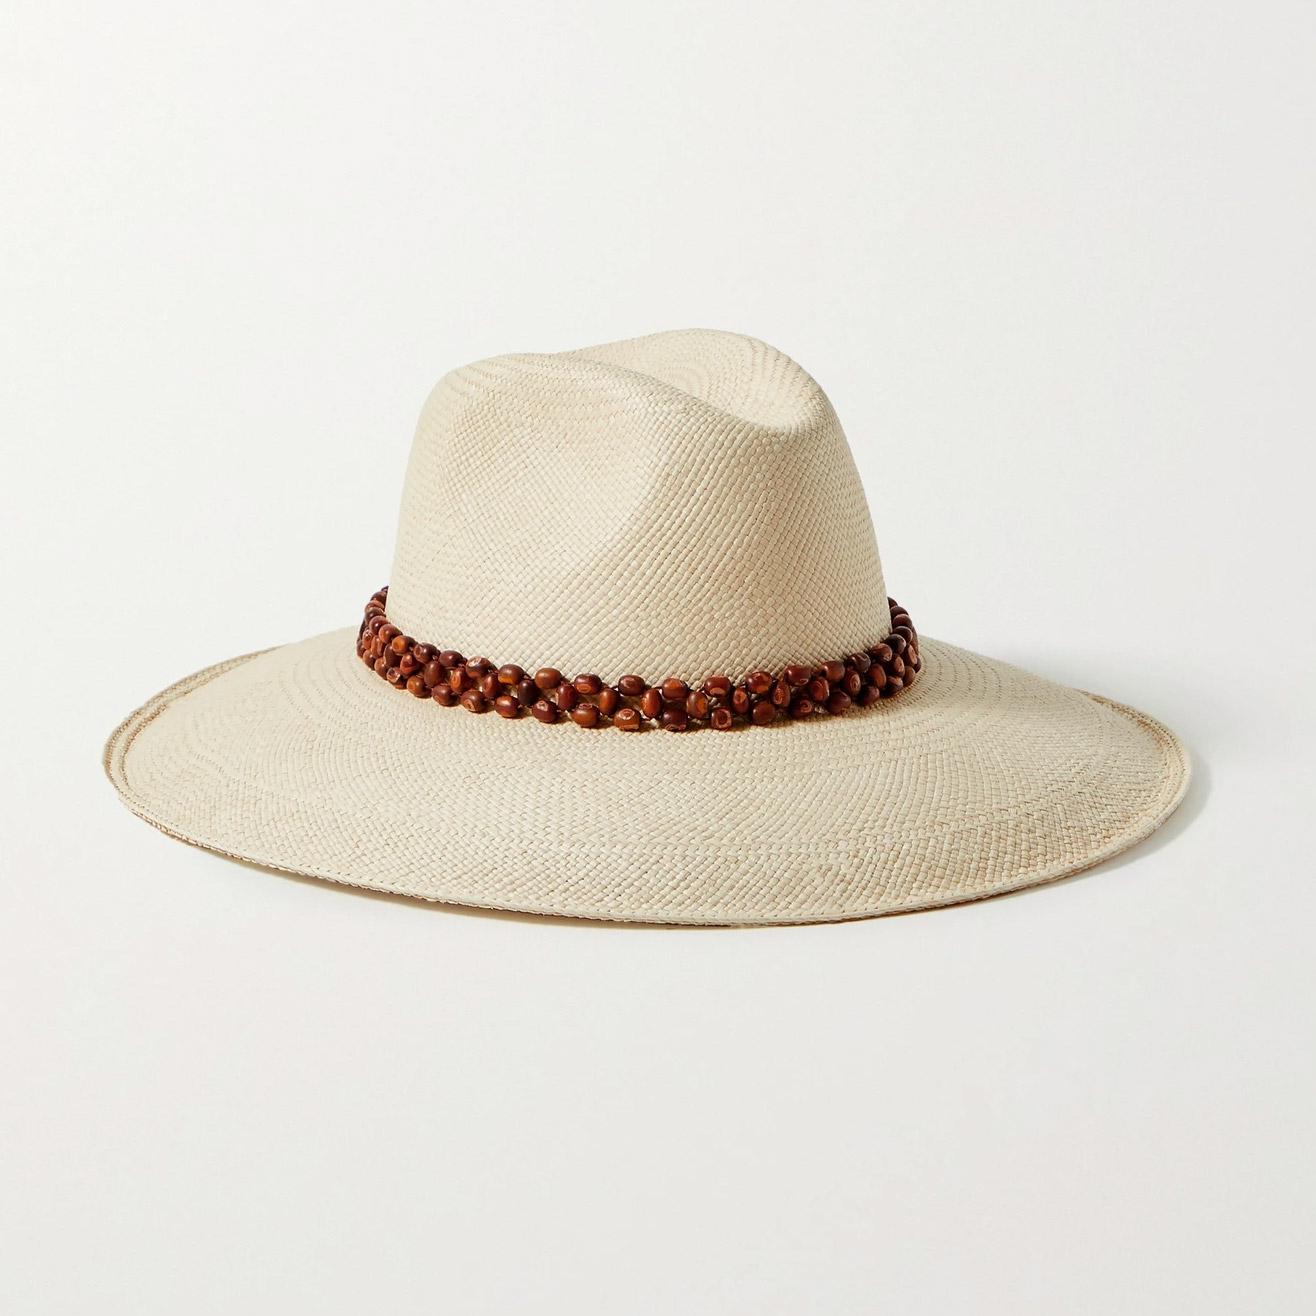 Artesano Peoni bead-embellished straw Panama hat